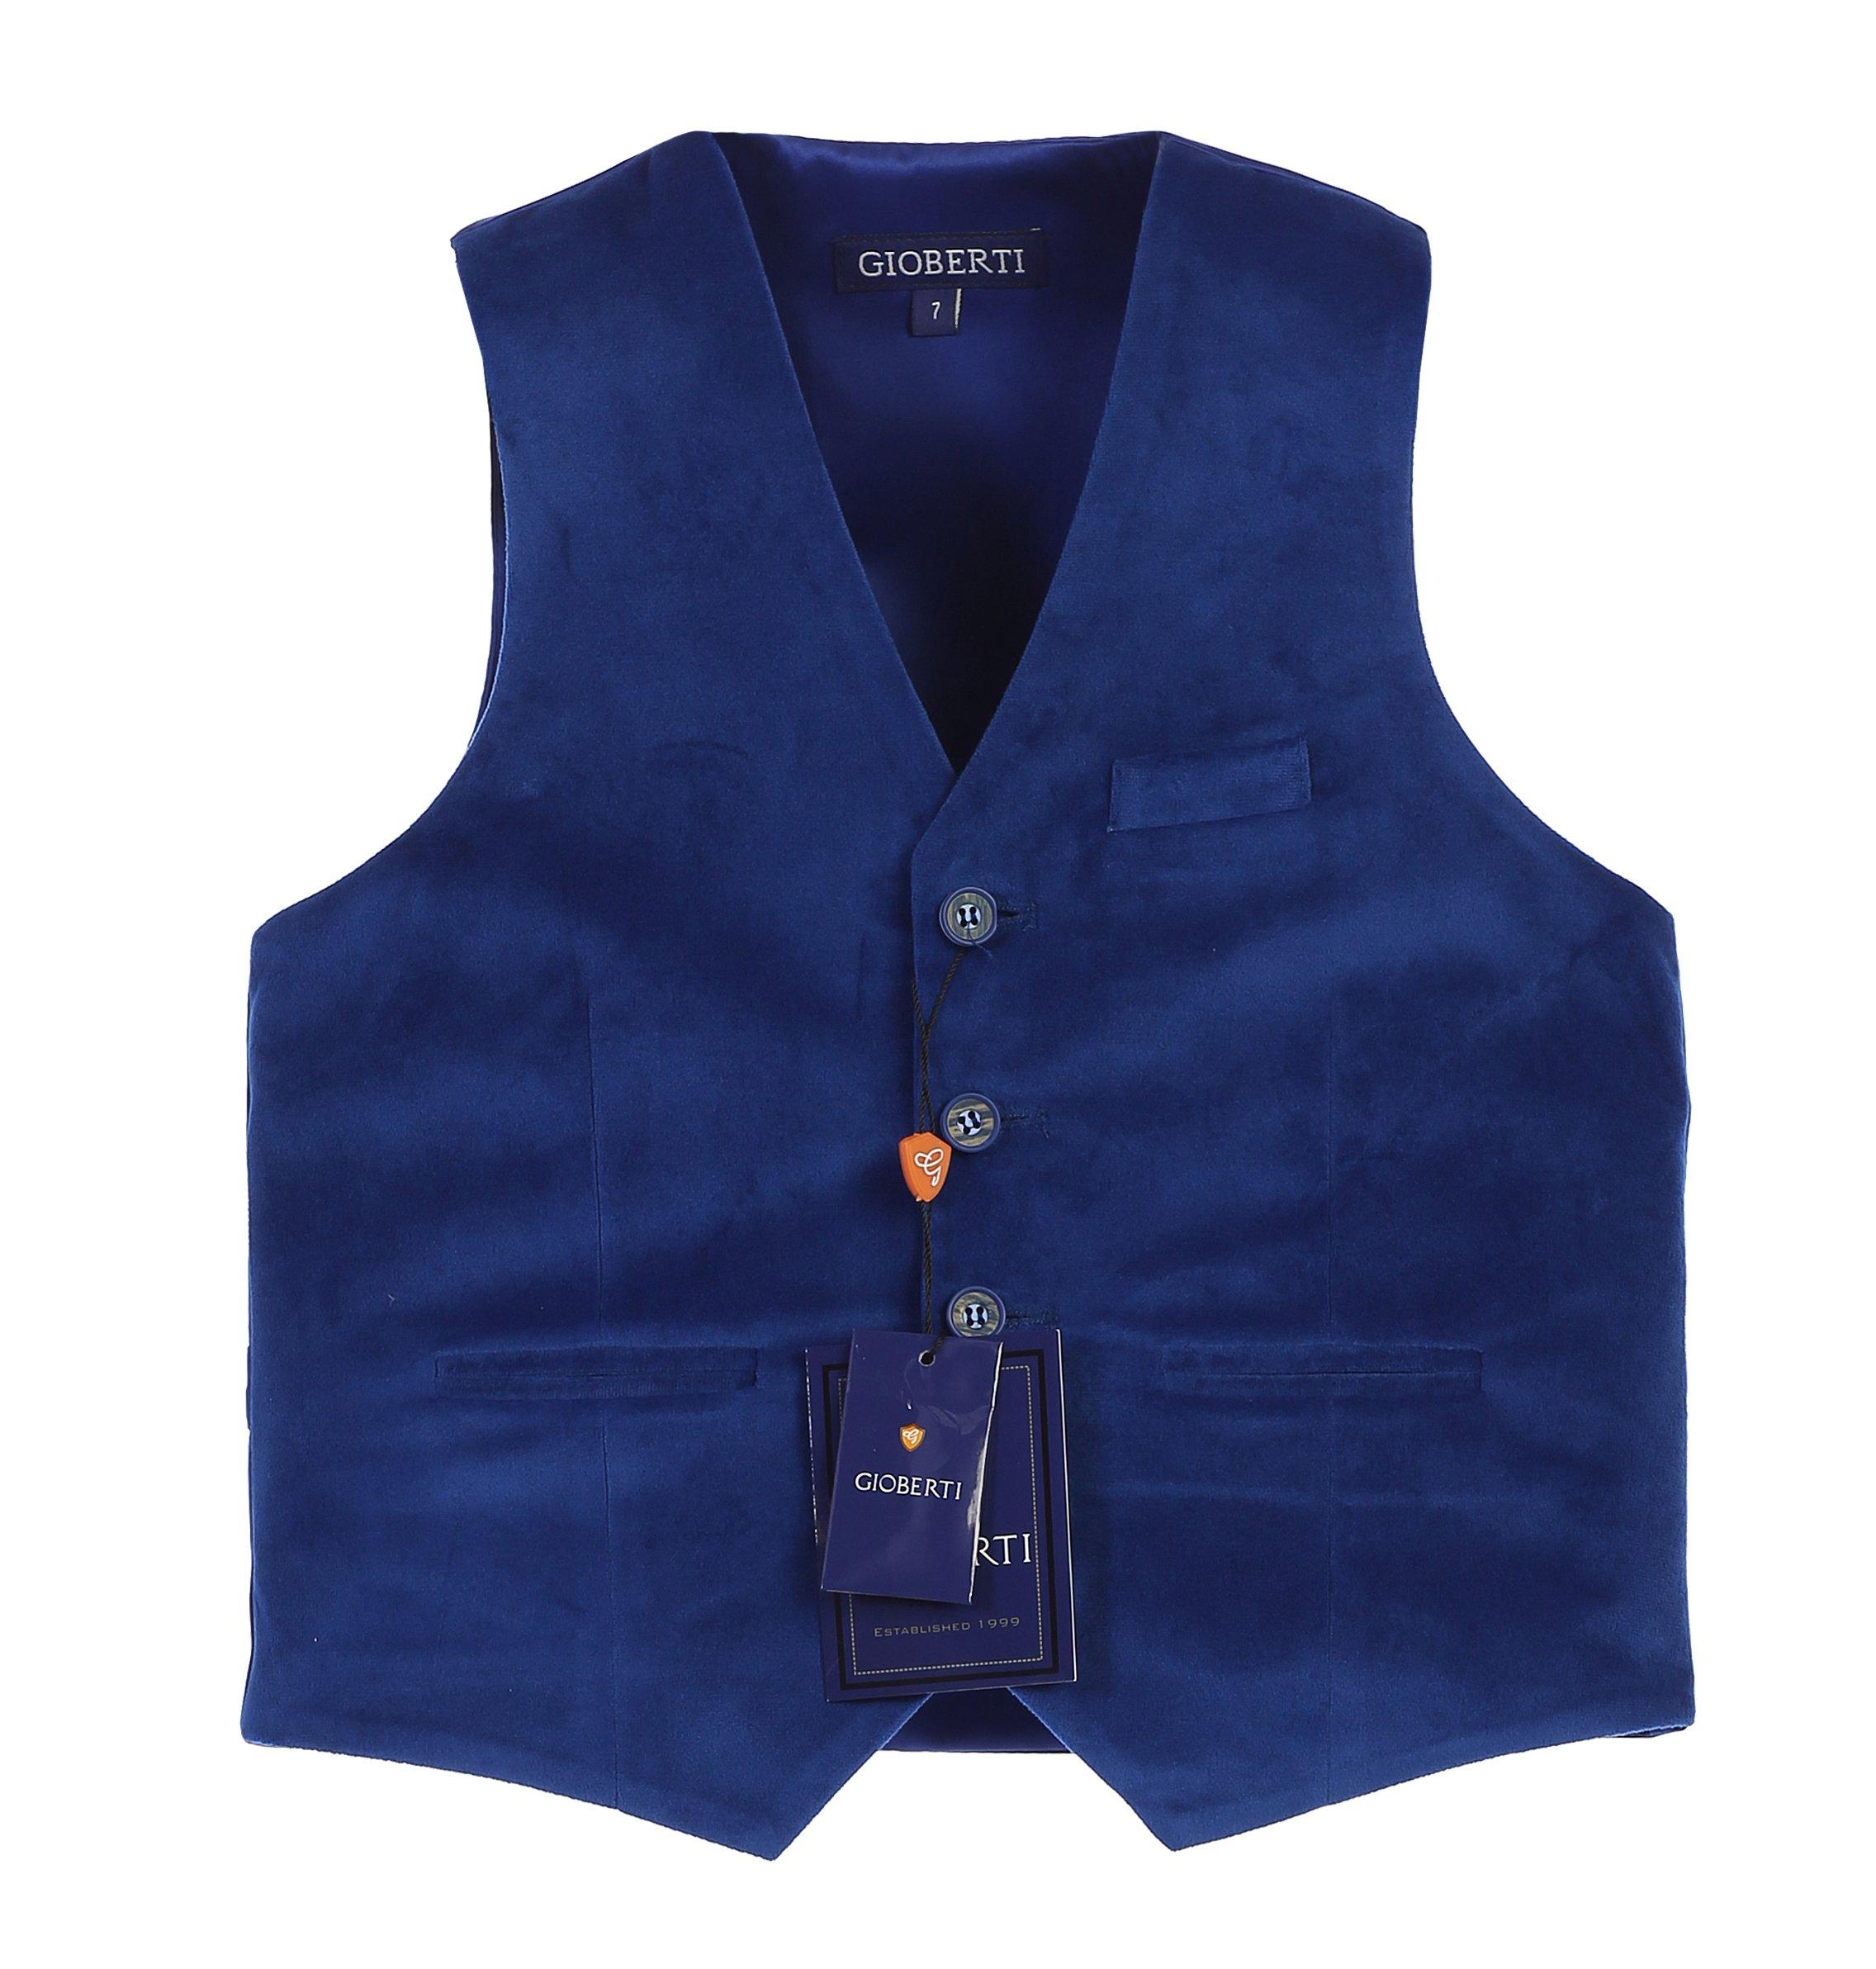 Gioberti Big Boys Velvet Formal Suit Vest, Royal Blue, Size 8